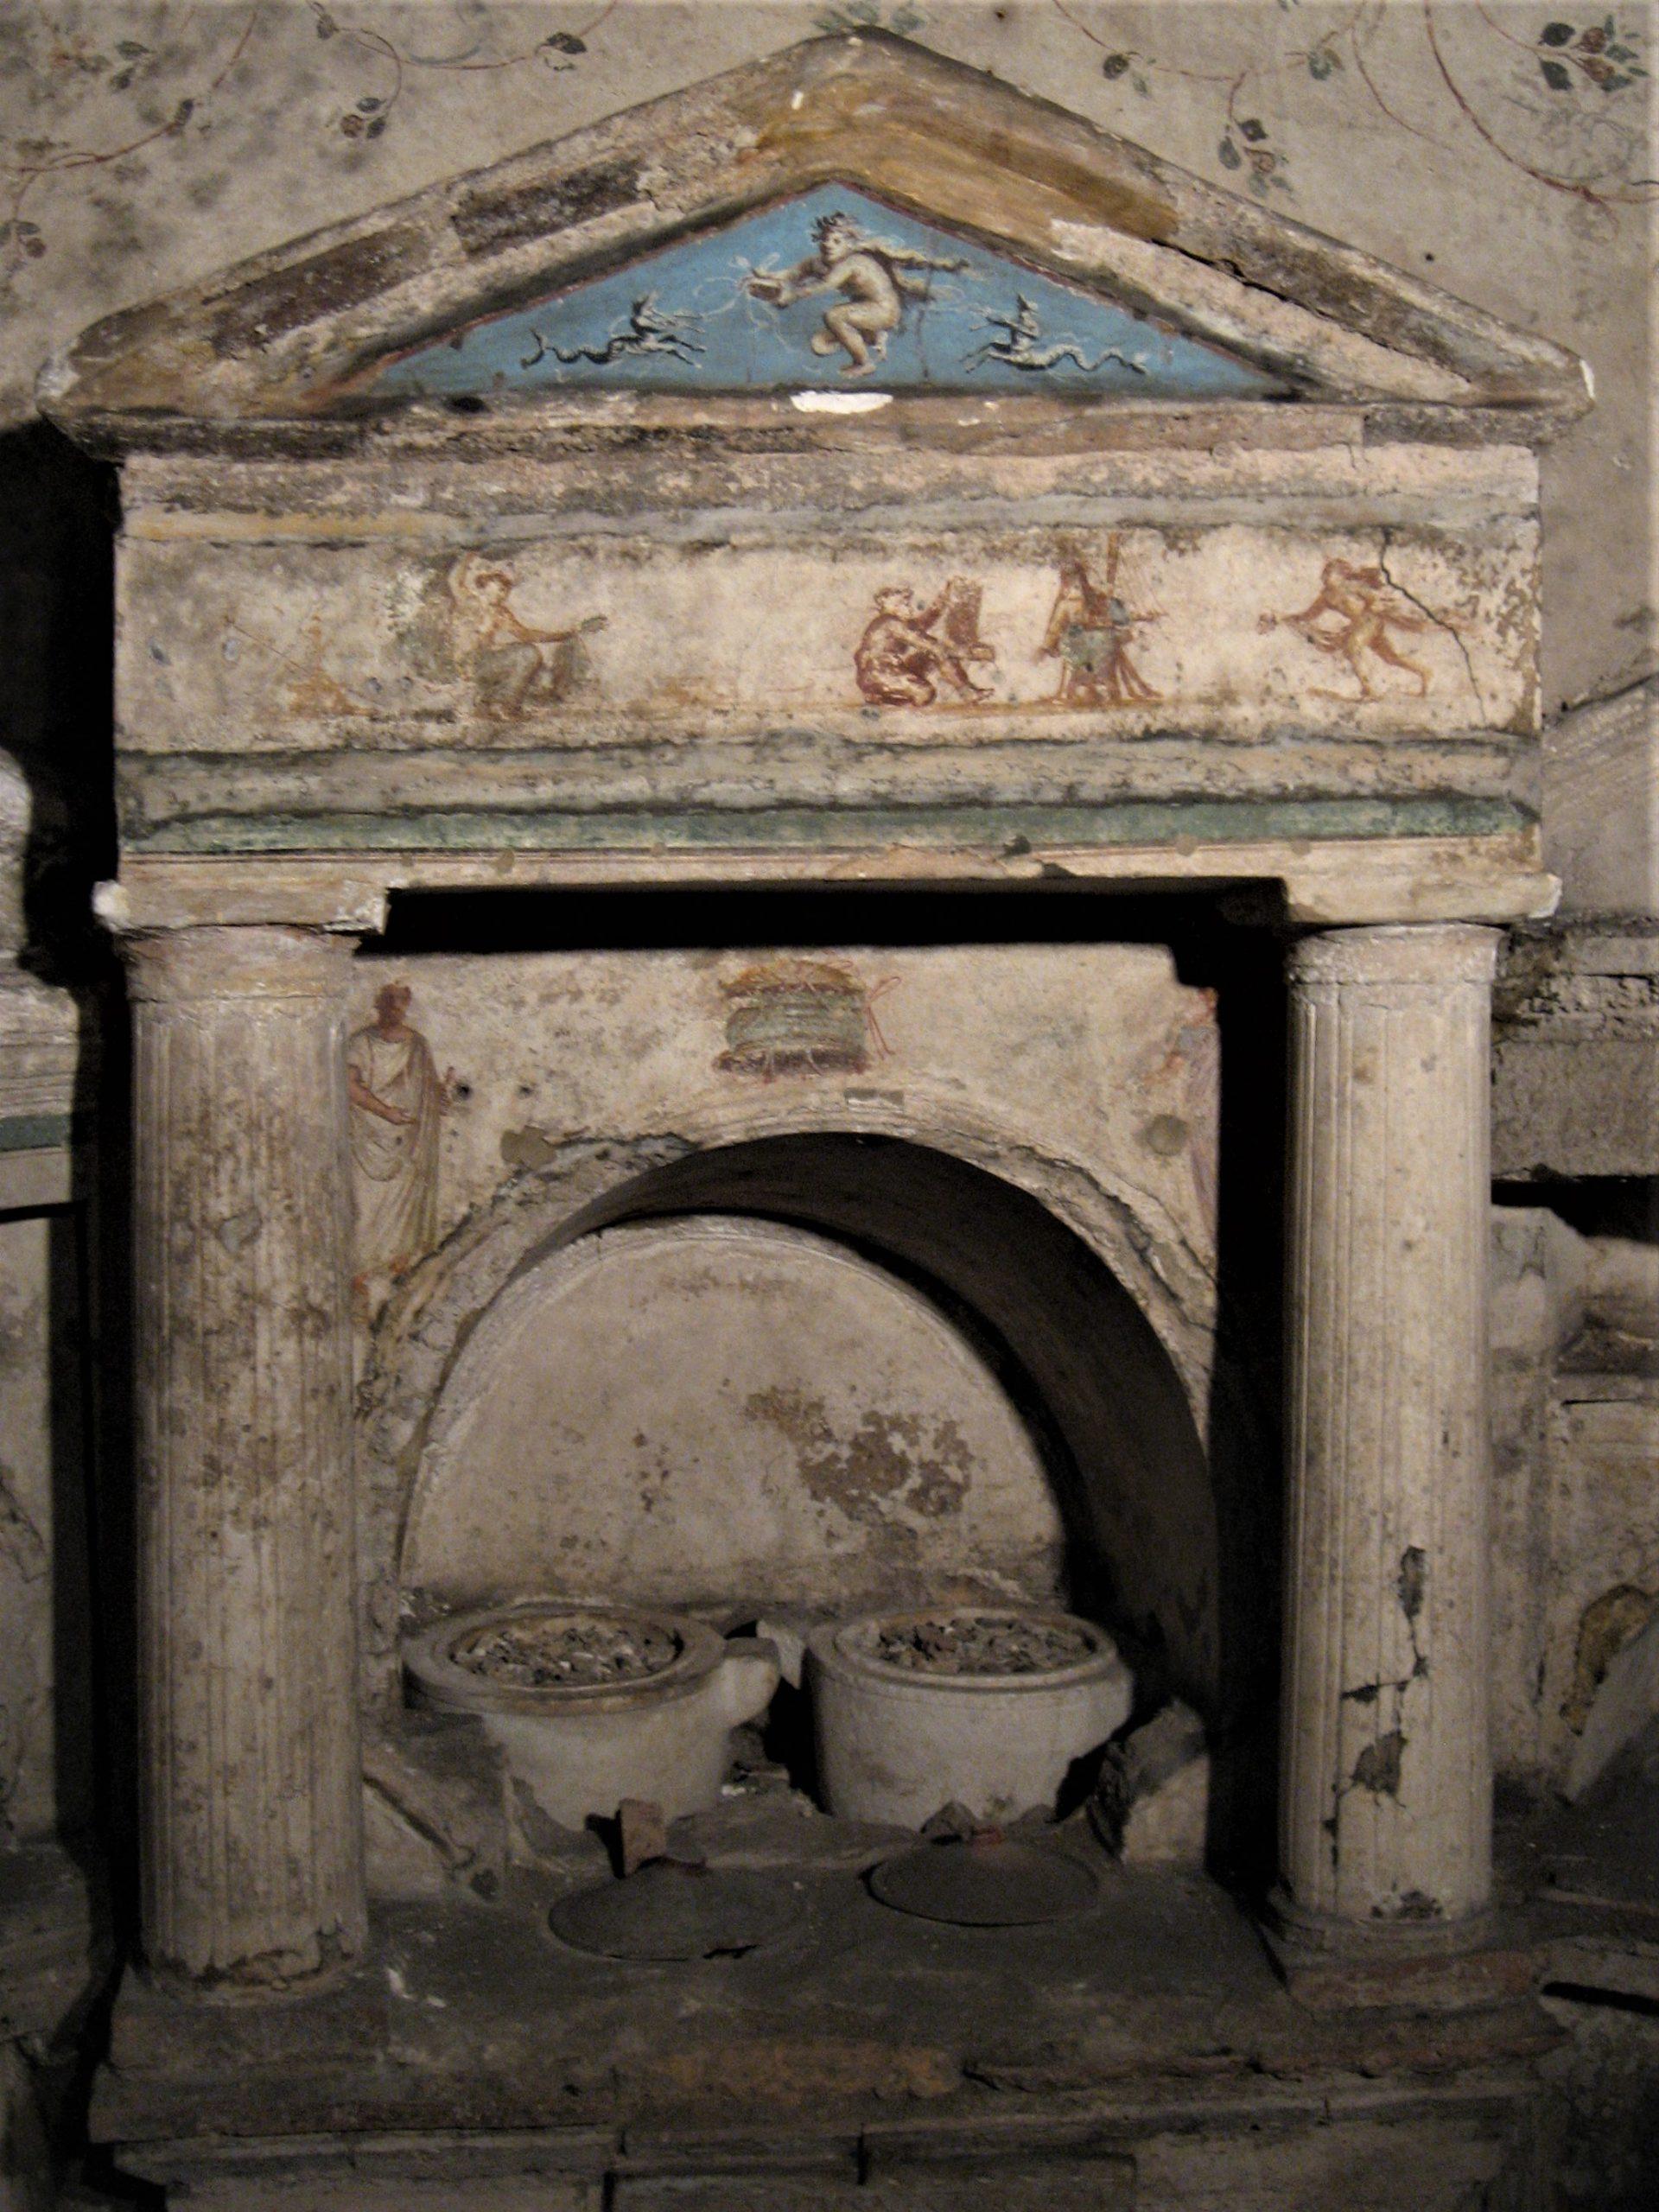 a niche in the Columbarium containing ash urns